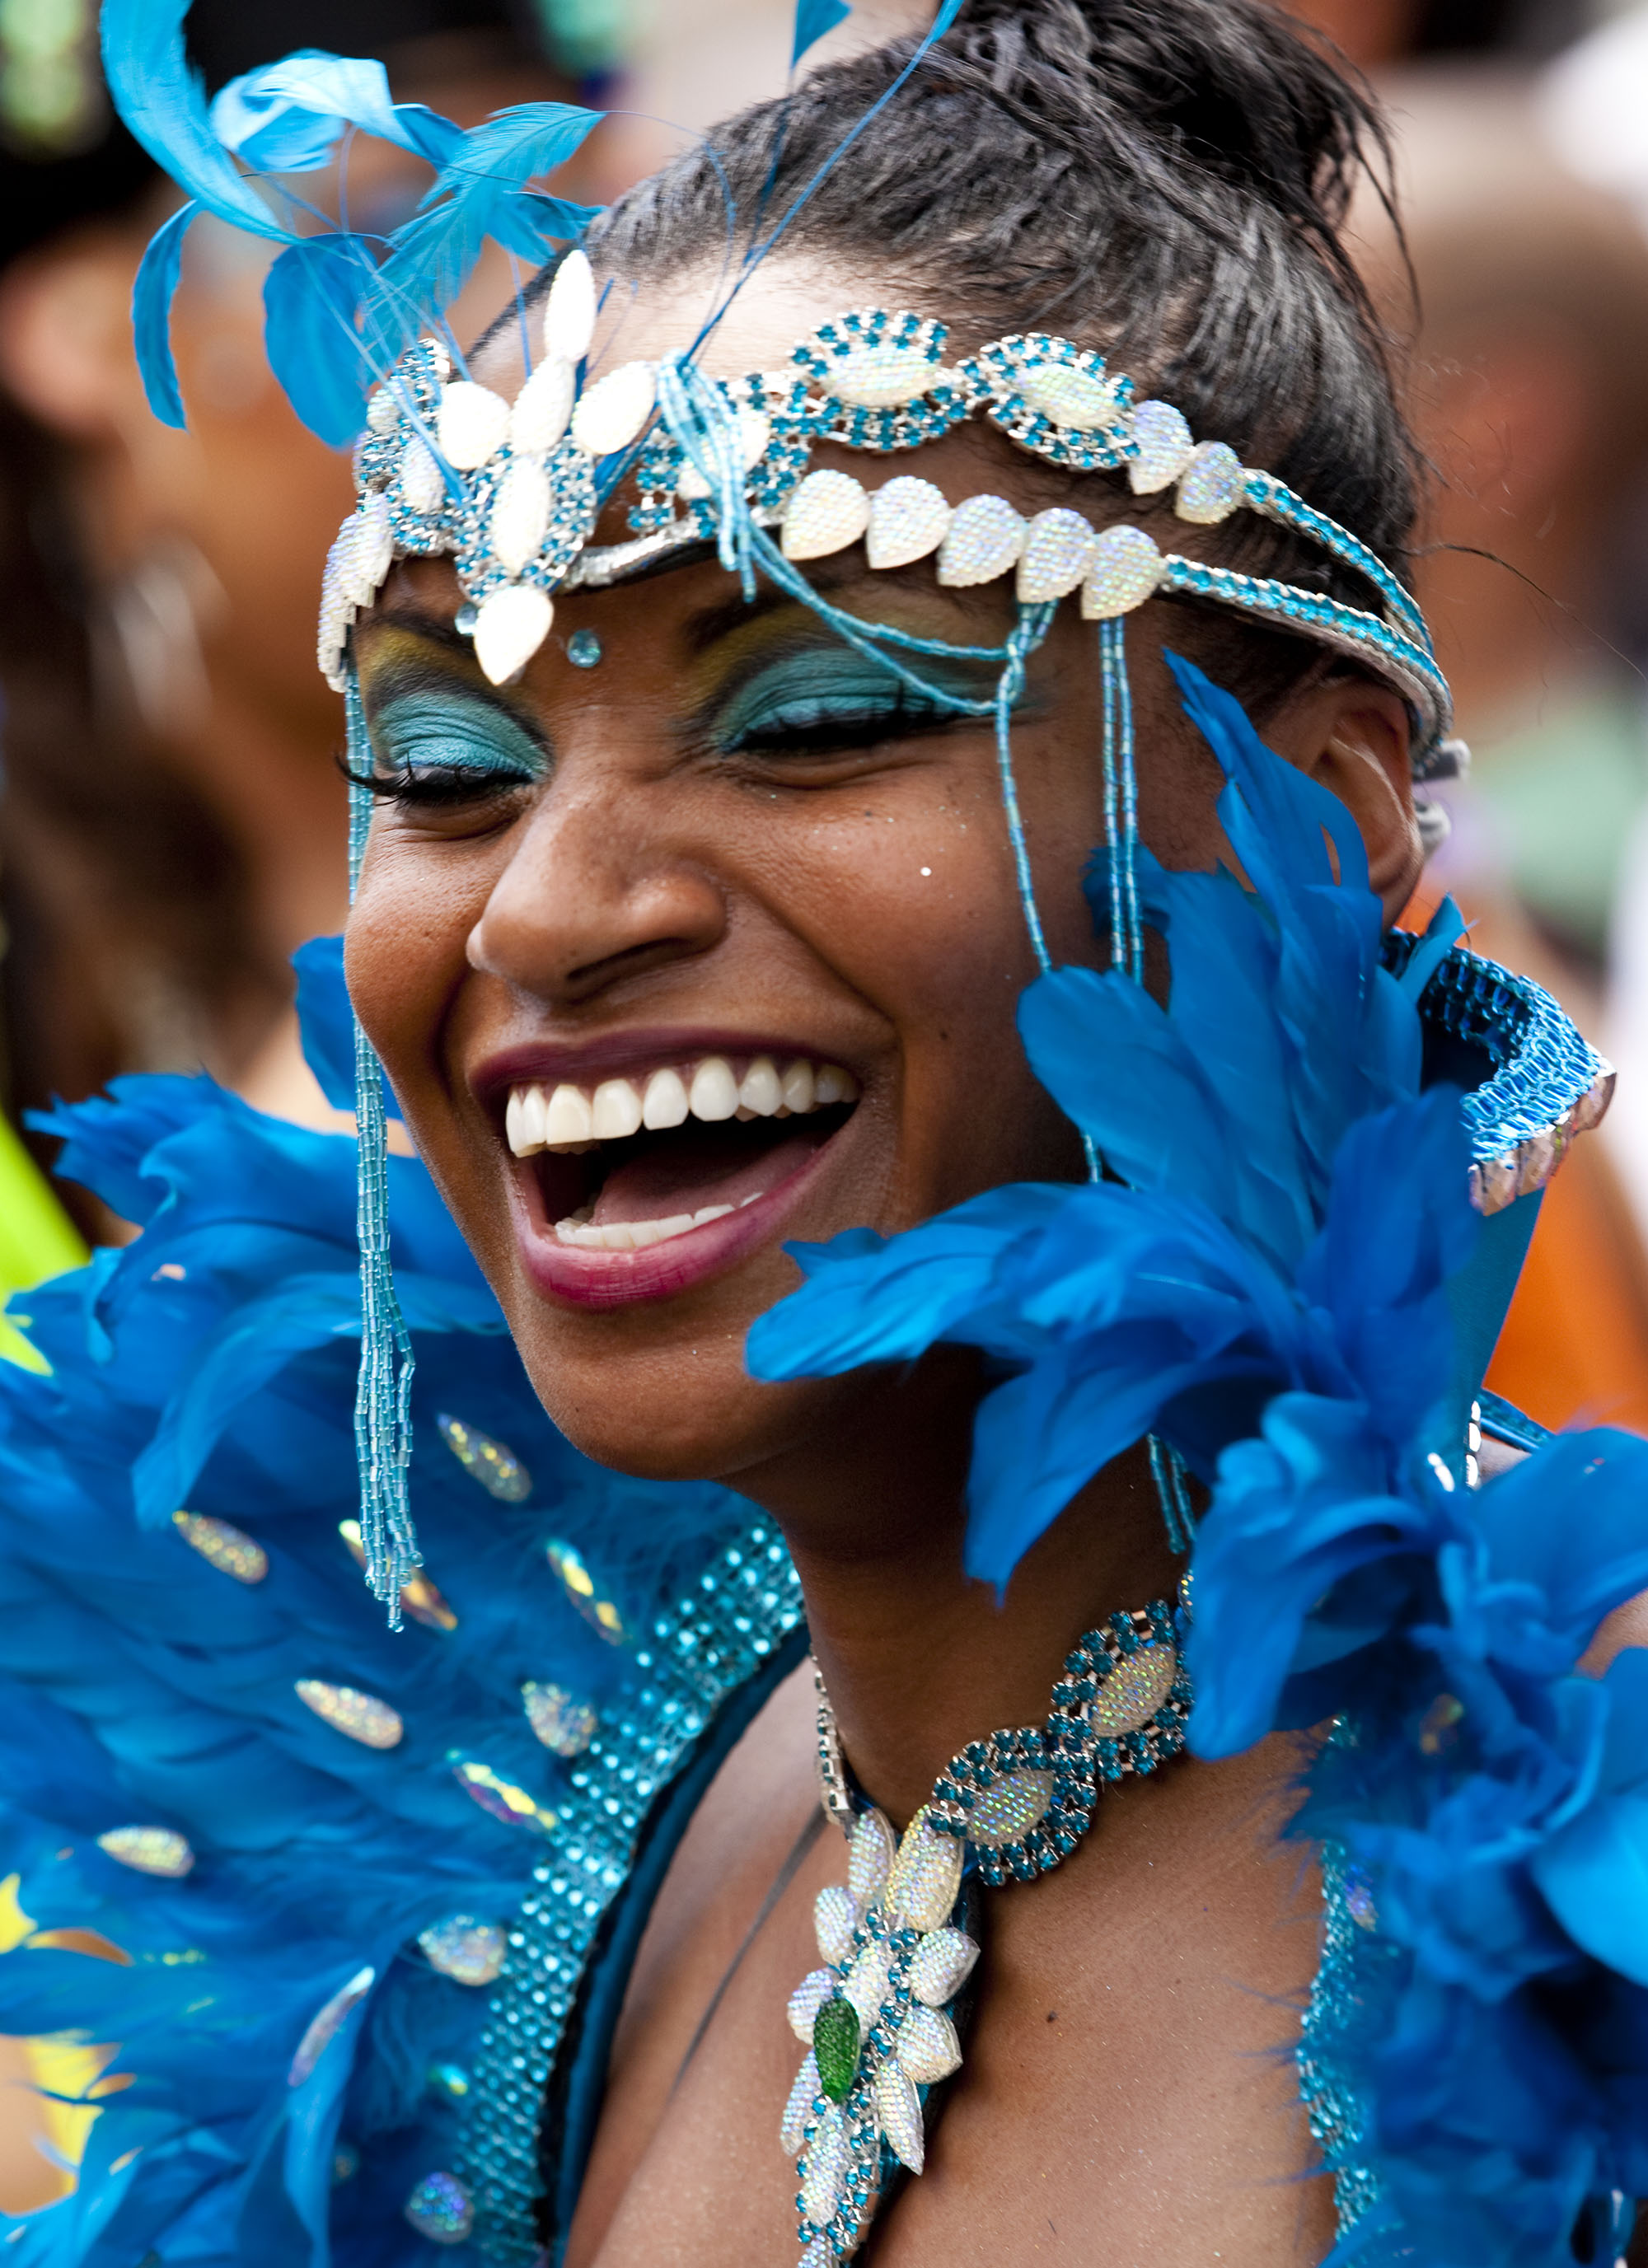 carnival_2921 copy©Jim-Raycroft.jpg